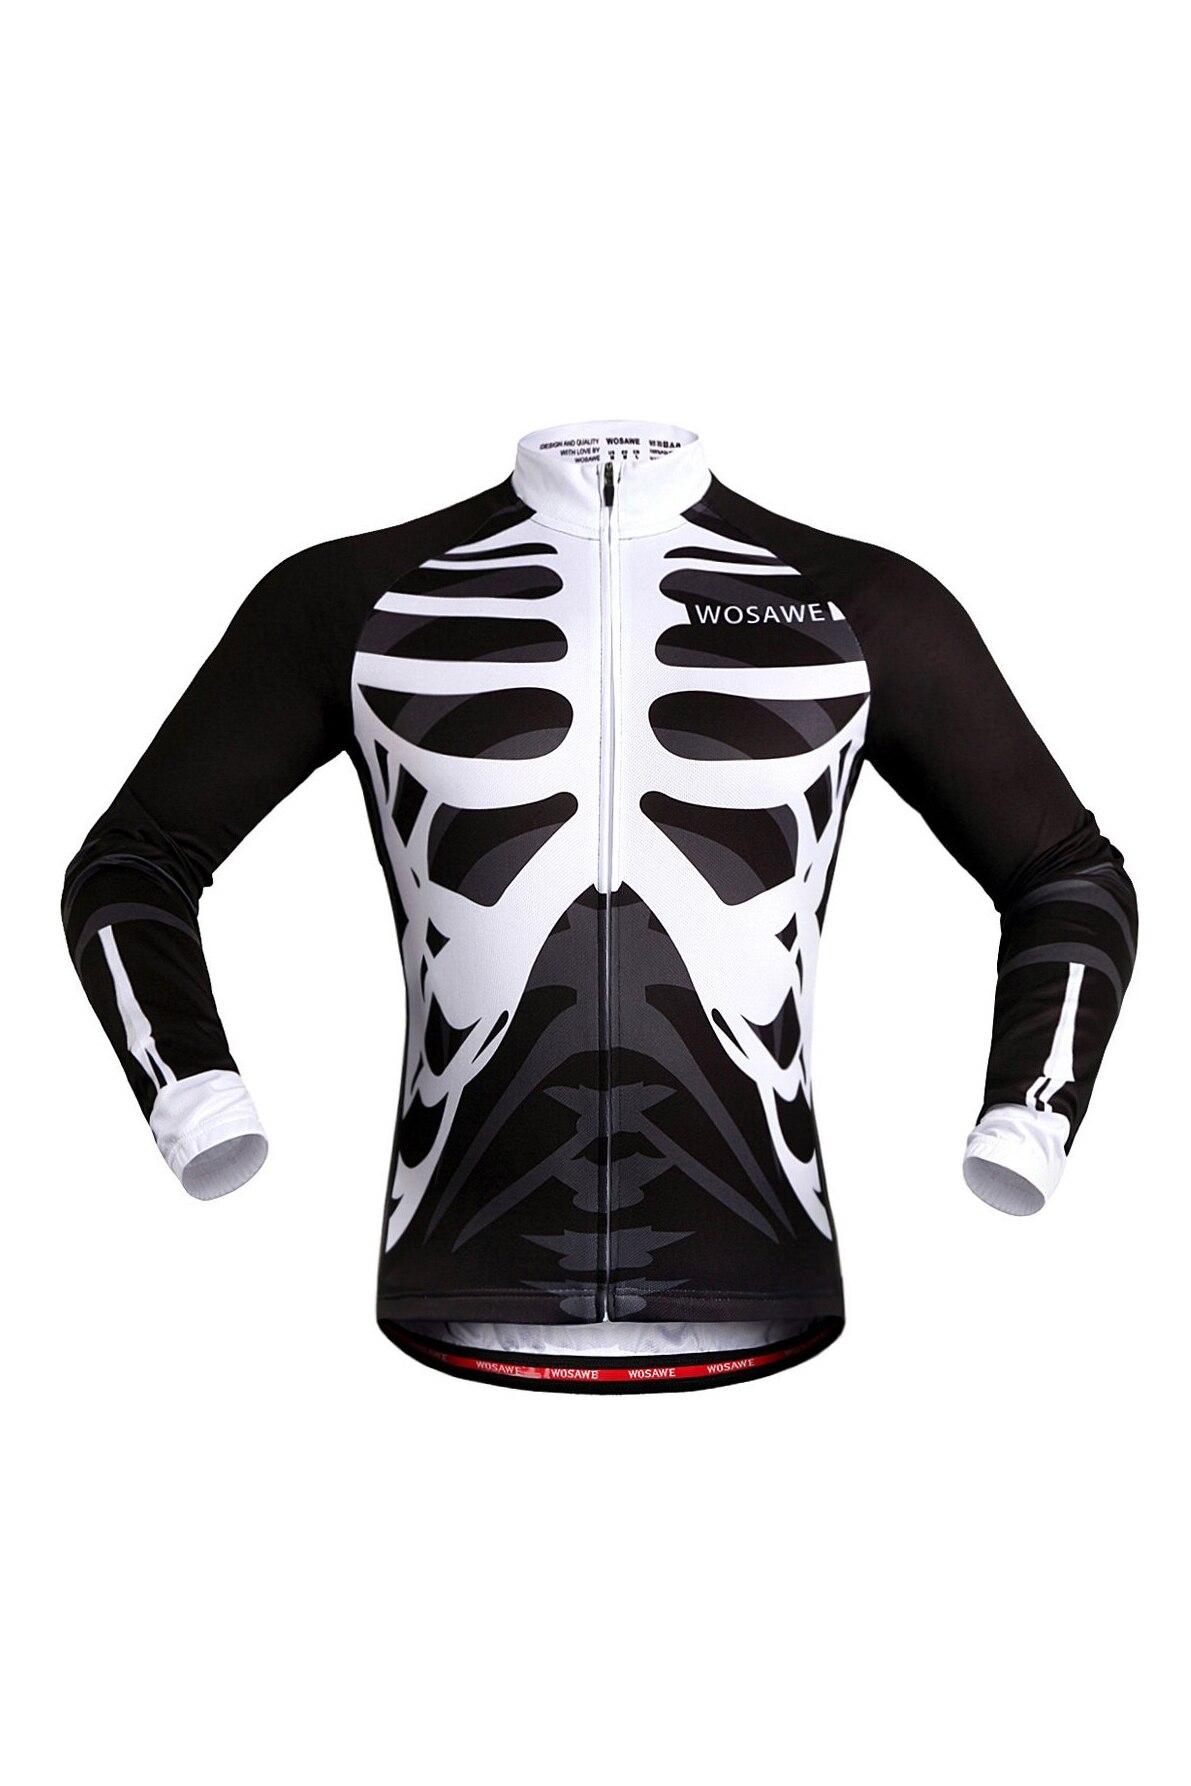 Windproof Cycling Jackets Men Women Riding Waterproof Cycle Clothing Bike Long Sleeve Jerseys Sleeveless Vest Wind Coat